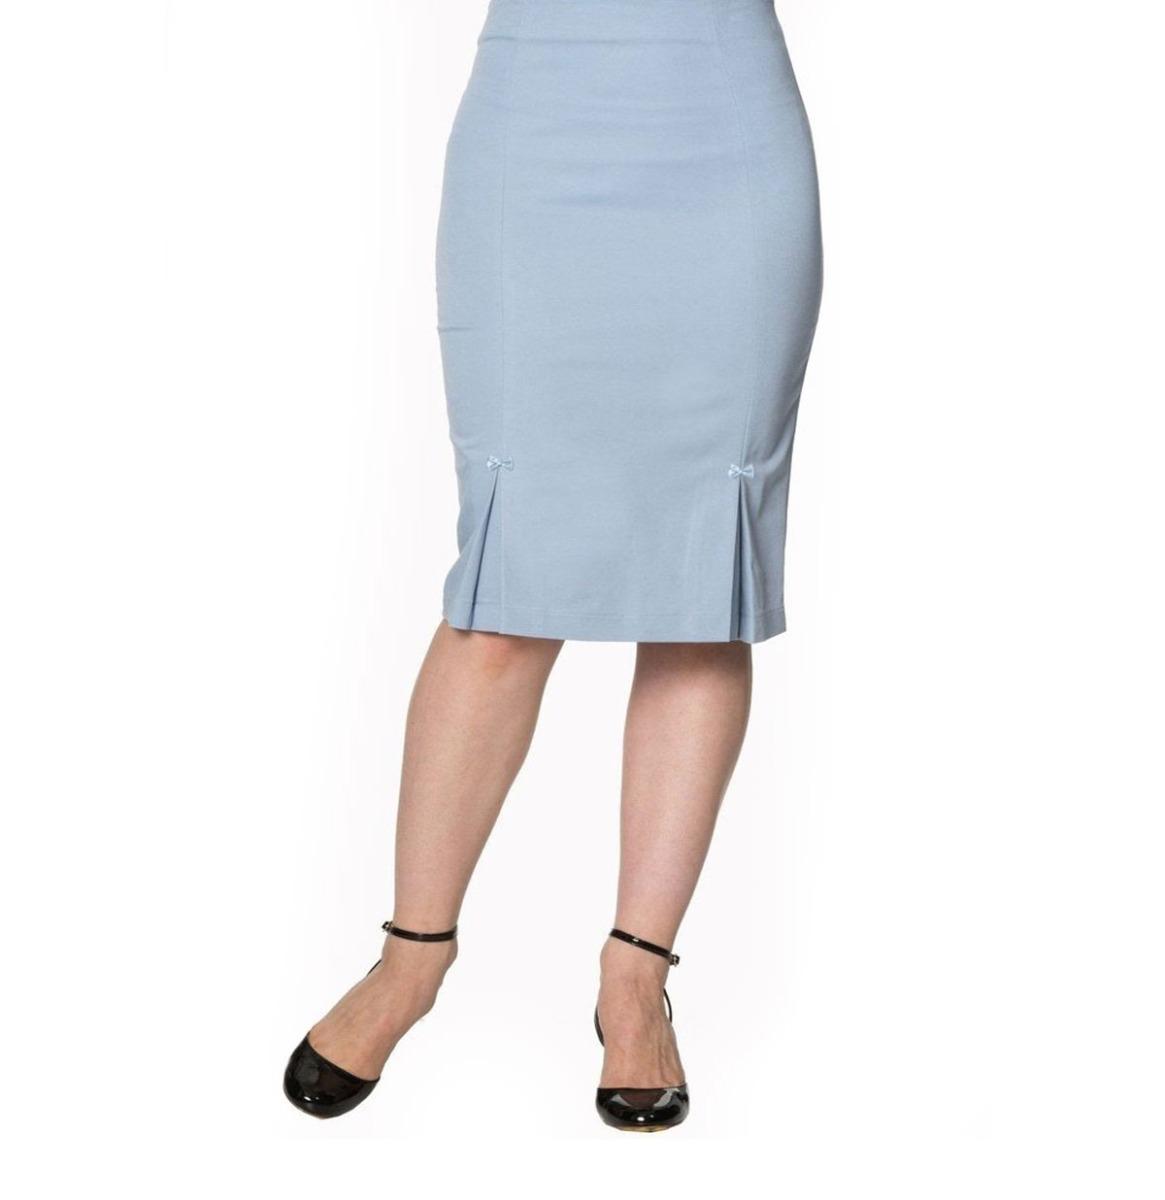 Guideing Light Skirt Zacht Blauw